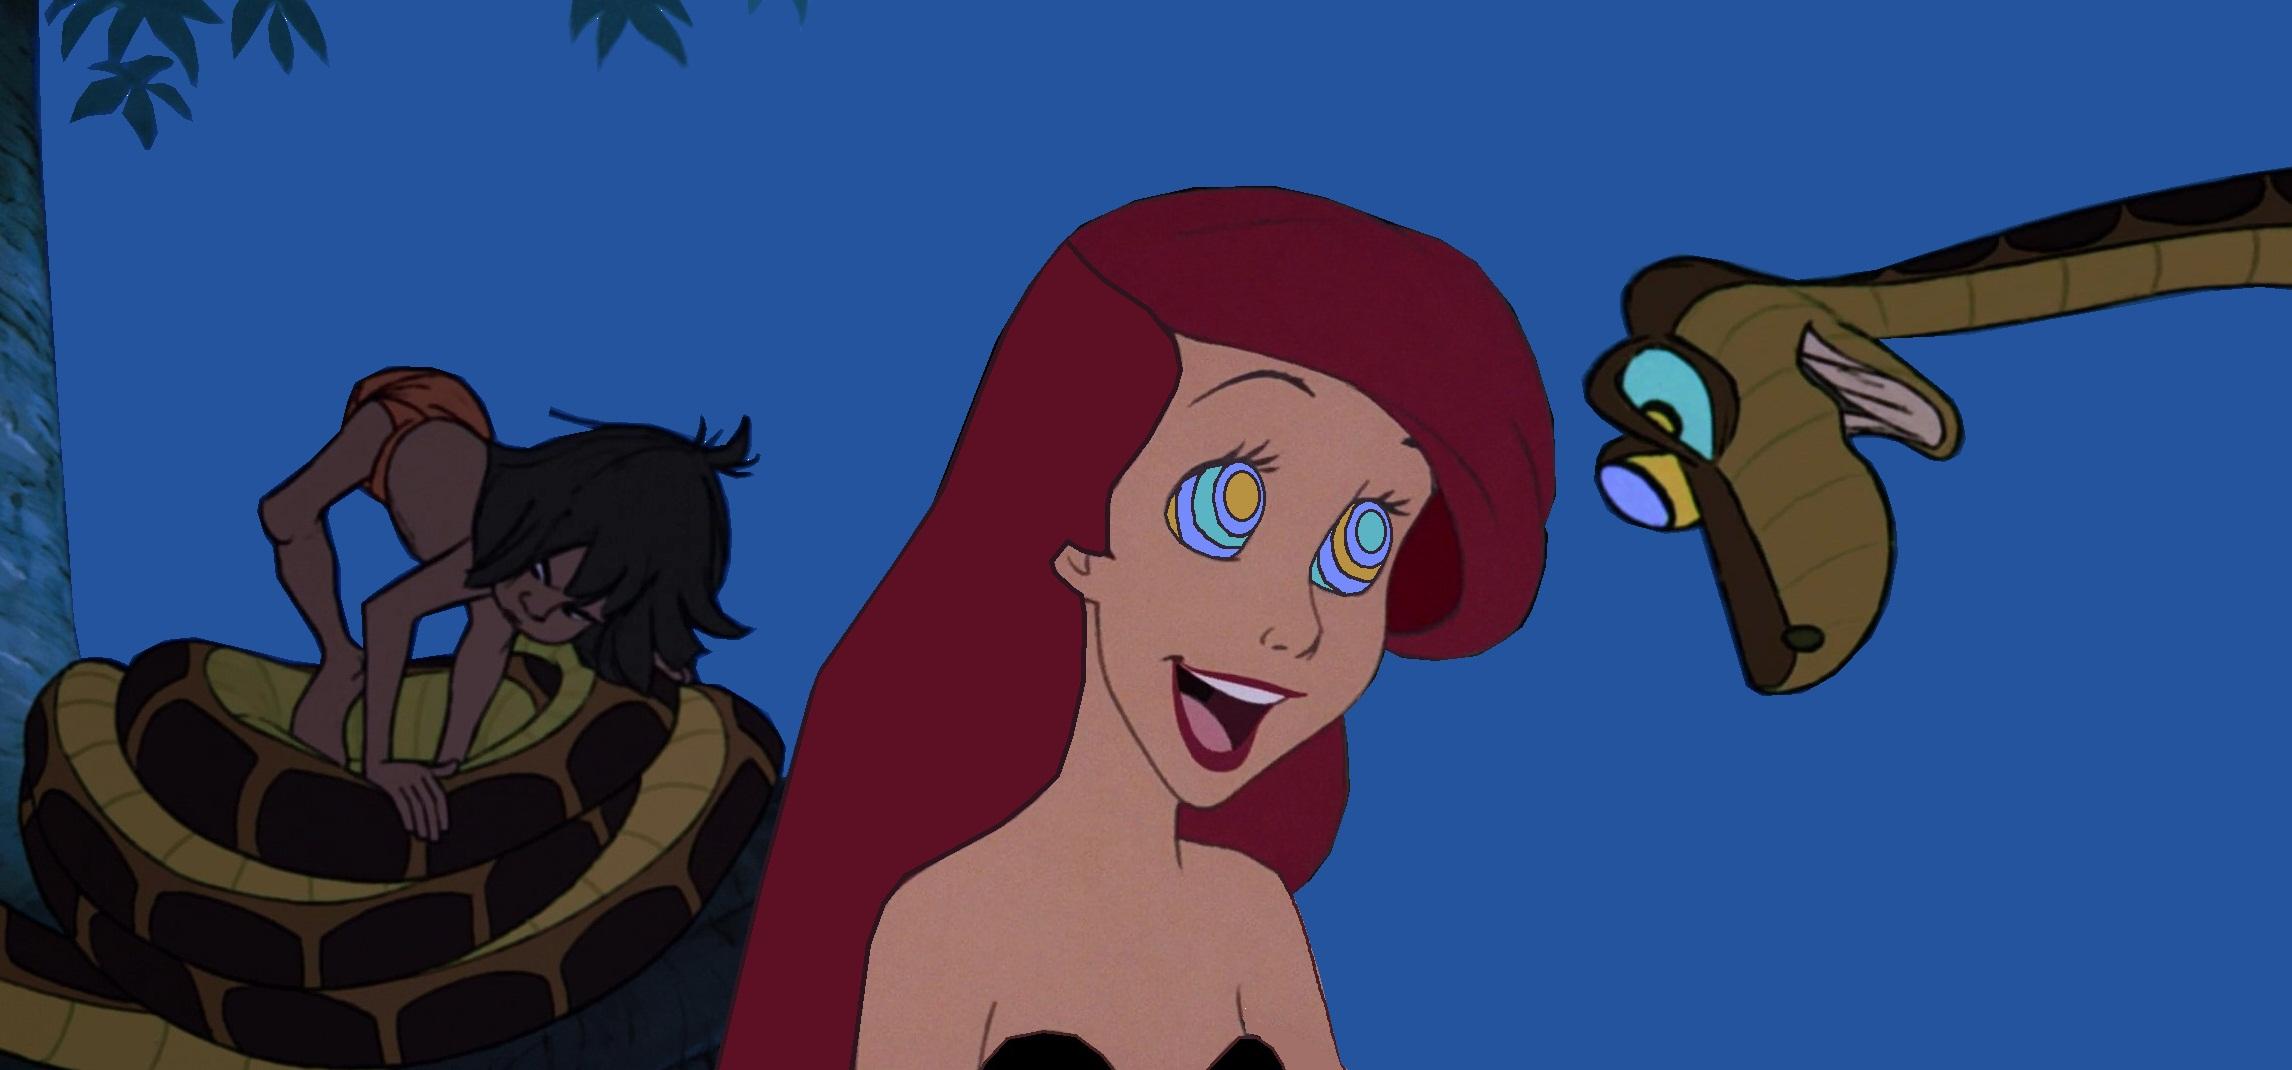 Ariel And Mowgli Porn ariel and mowgli meet kaahypnotica on deviantart   joss